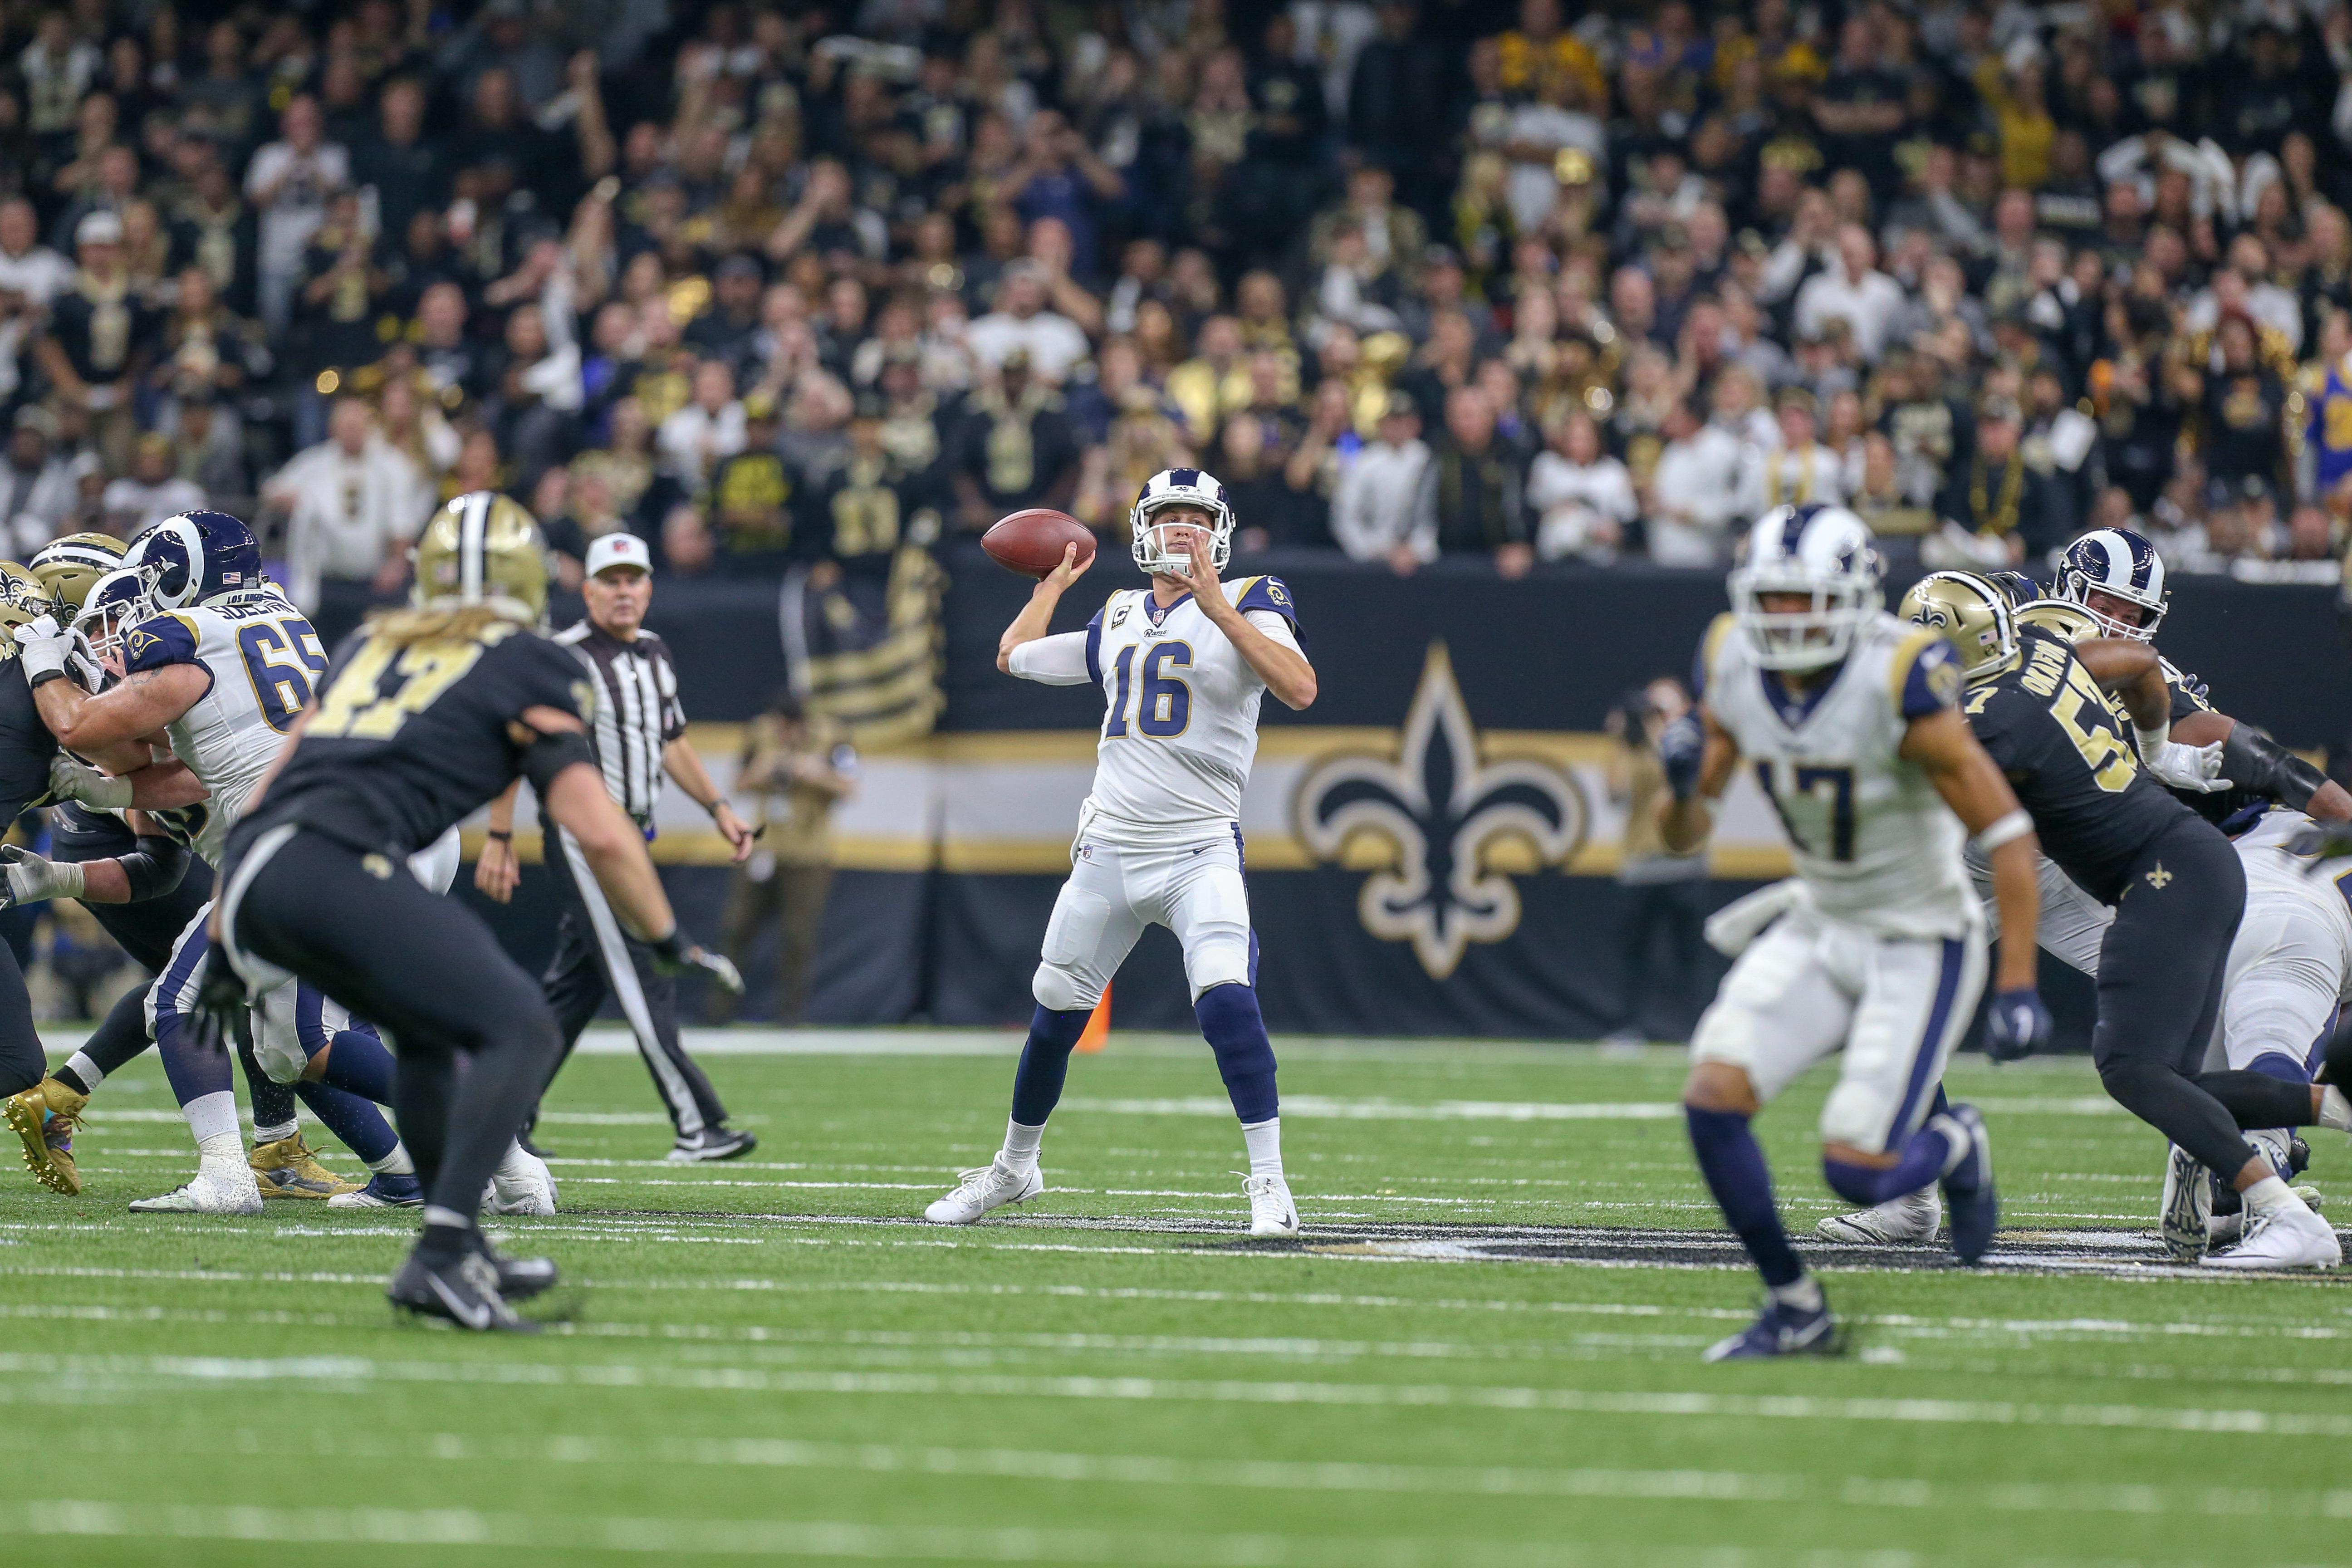 NFL: JAN 20 NFC Championship Game - Rams at Saints